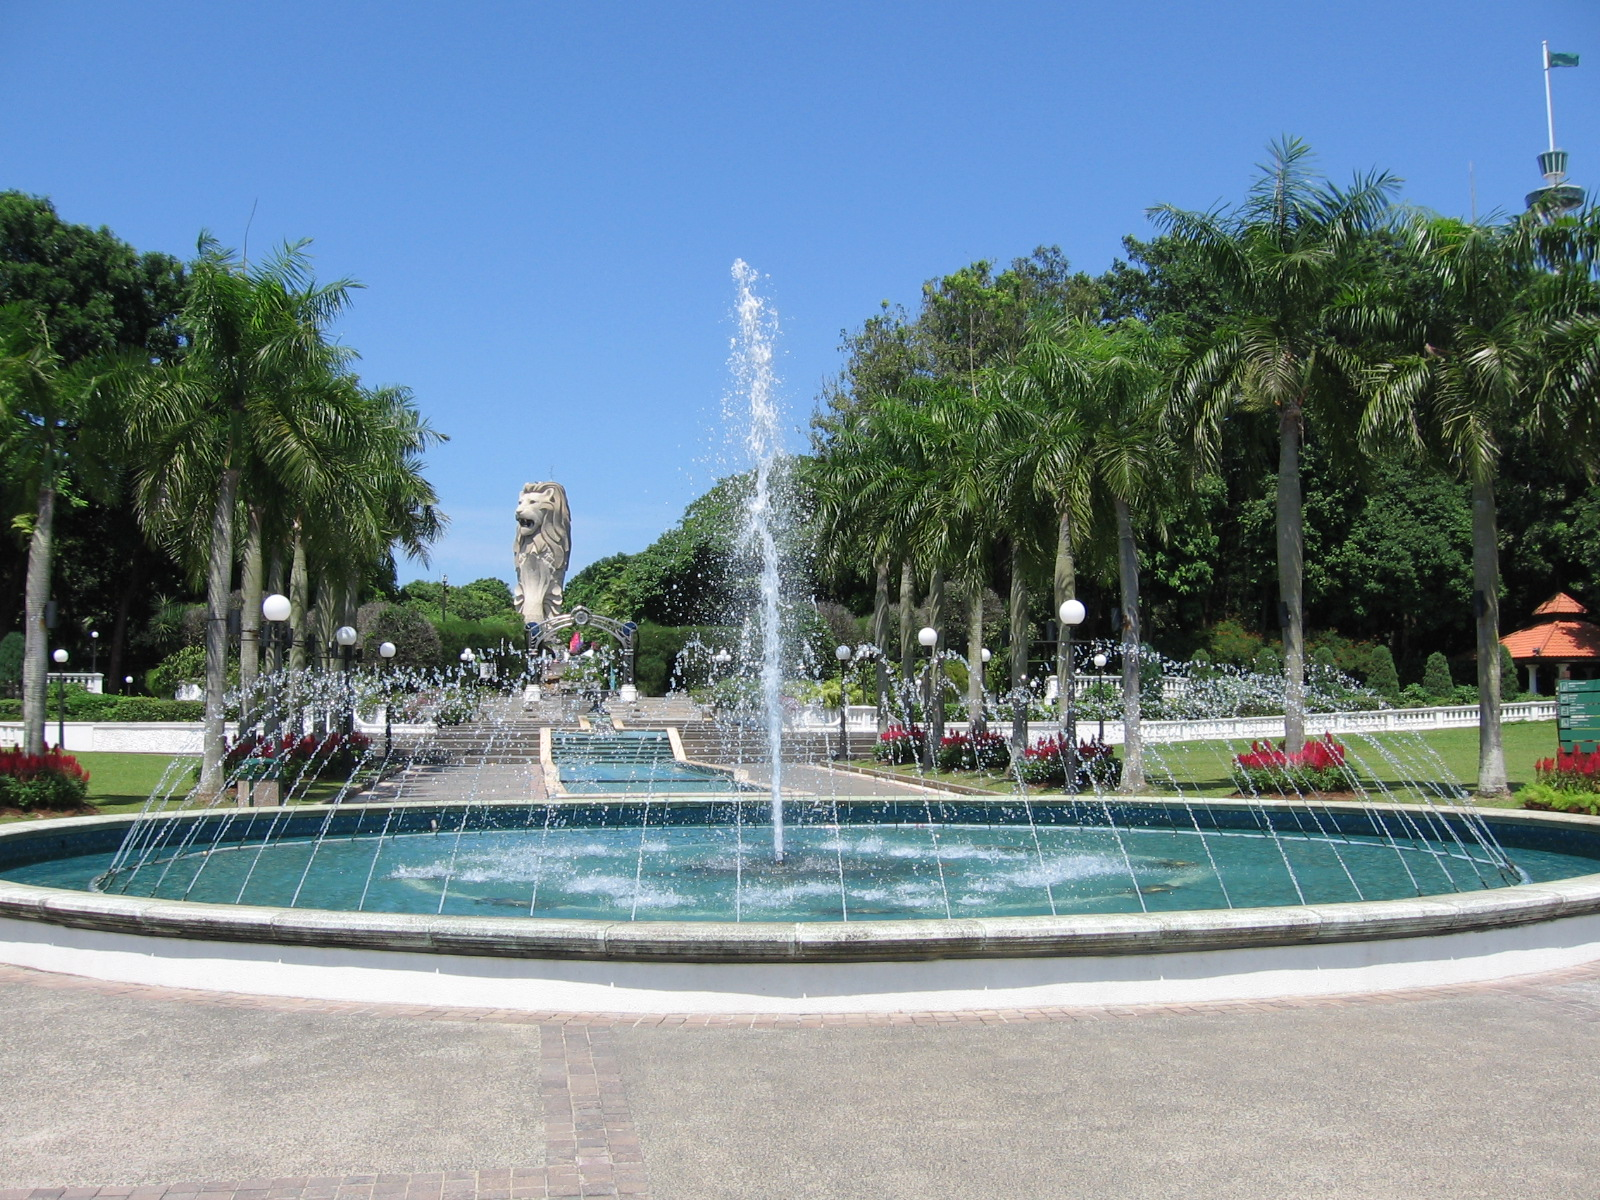 File:Fountain Gardens 5, Sentosa, Aug 06.JPG